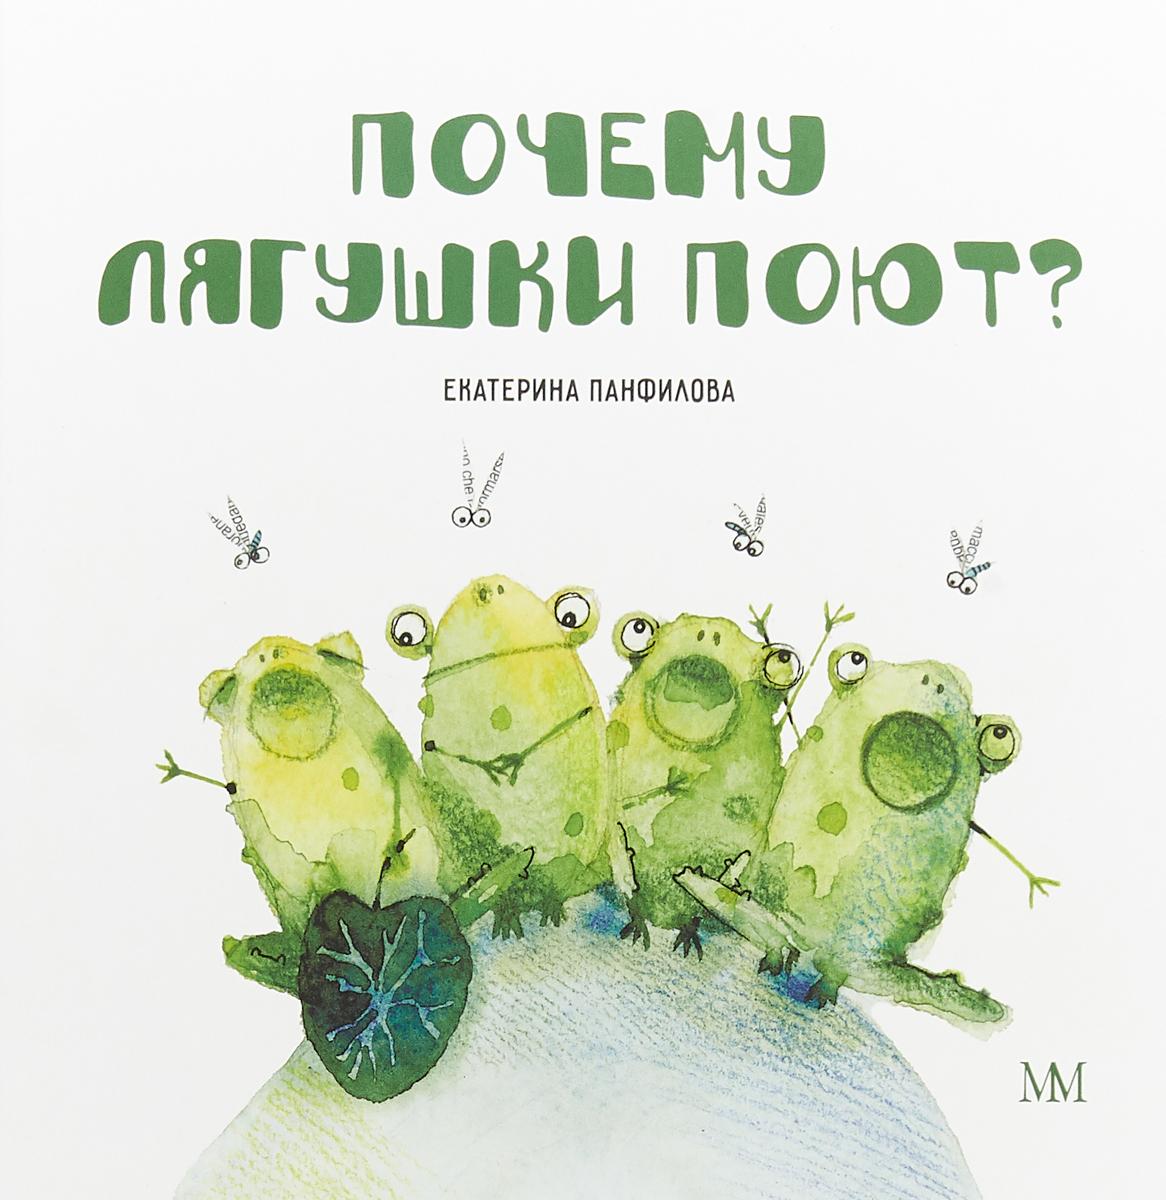 Почему лягушки поют? | Панфилова Екатерина Владимировна